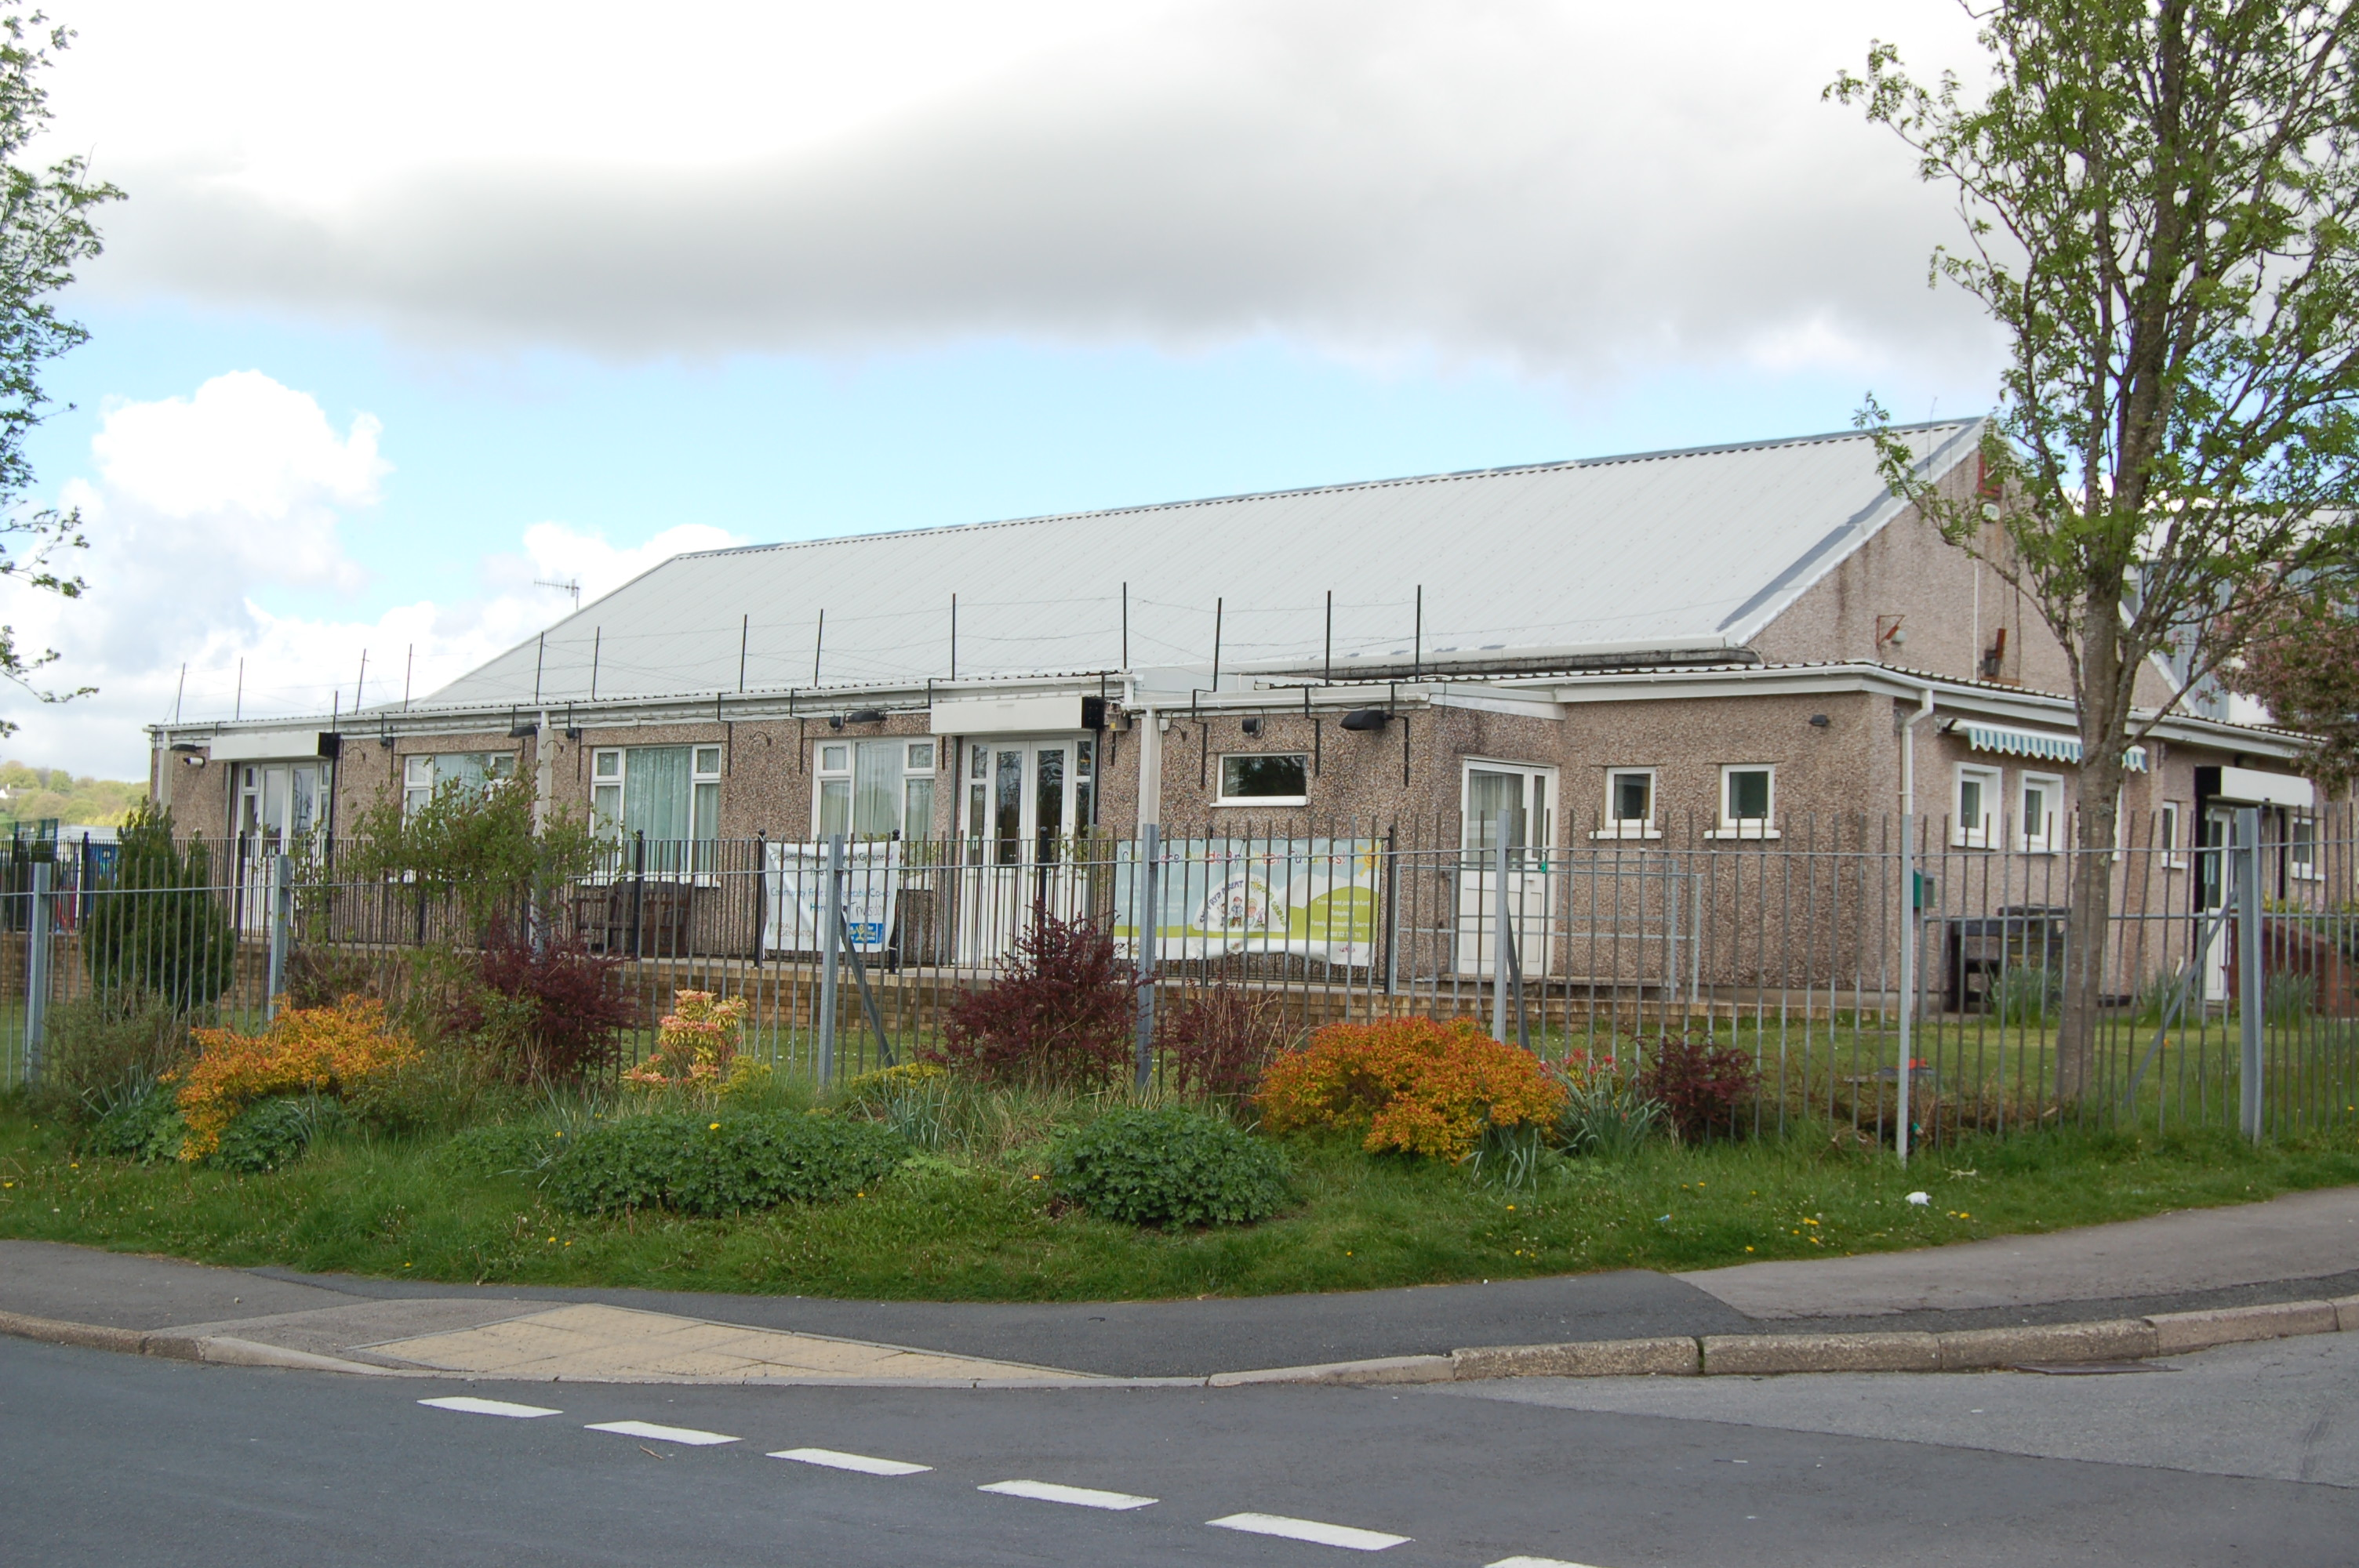 Swffryd Community Centre